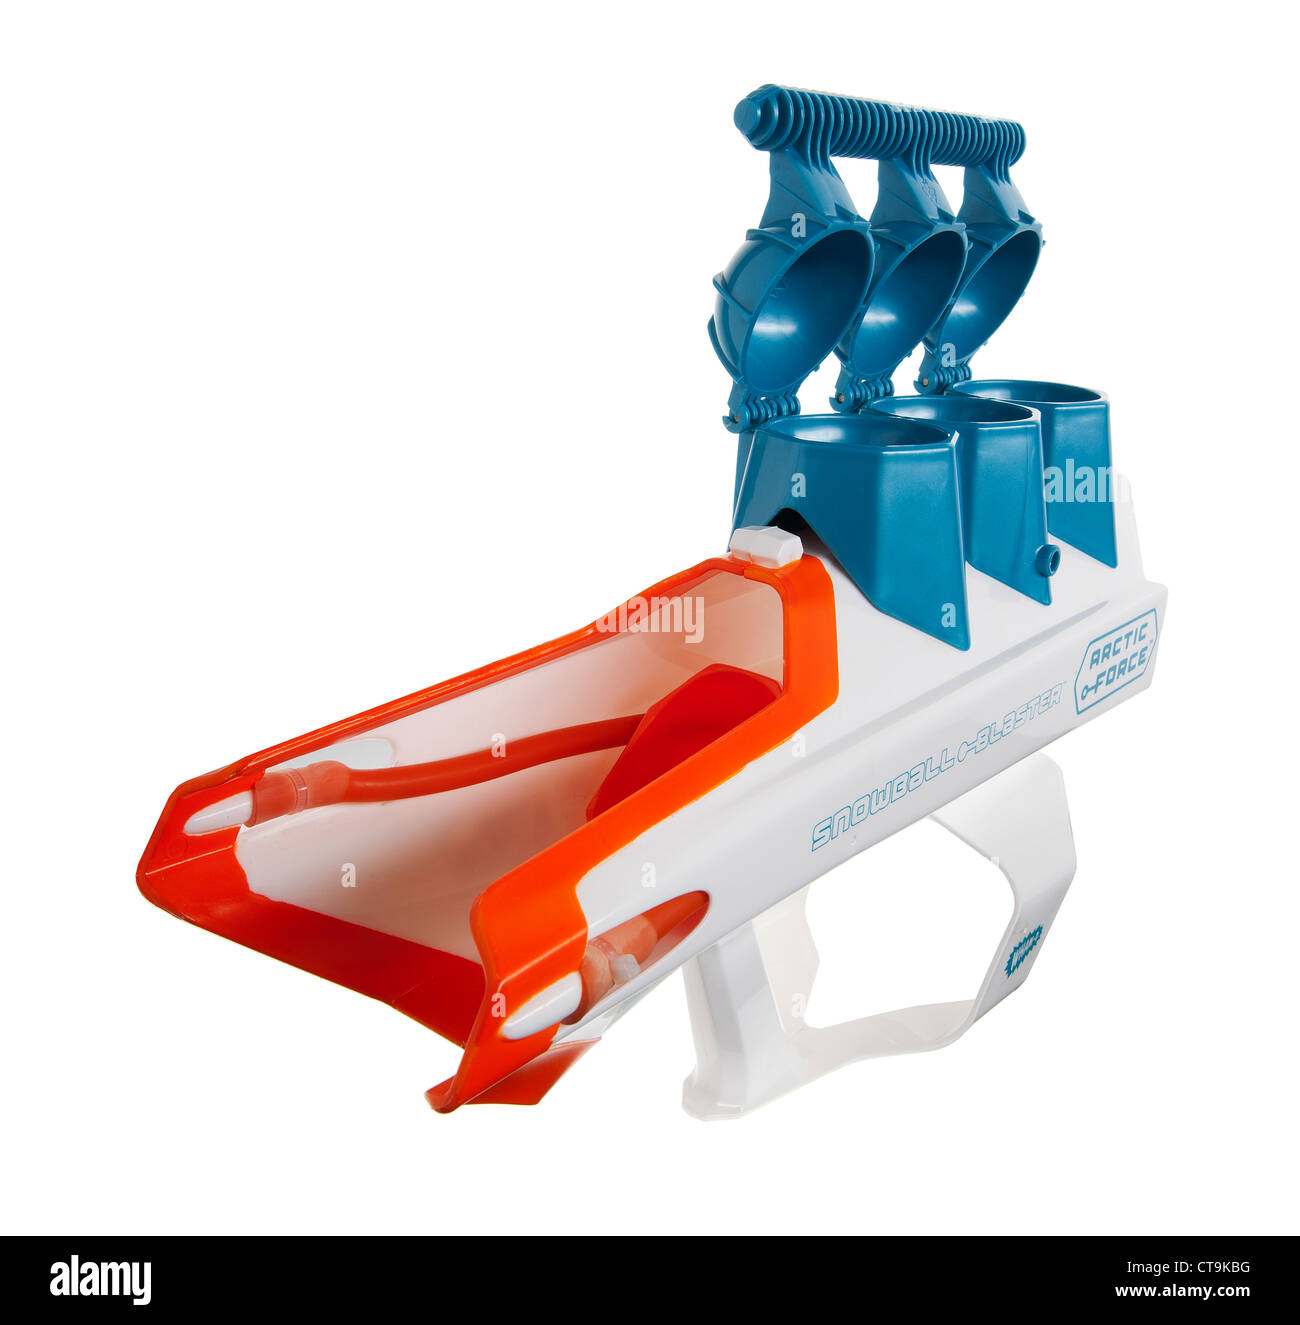 Snowball launcher or catapult gun - Stock Image